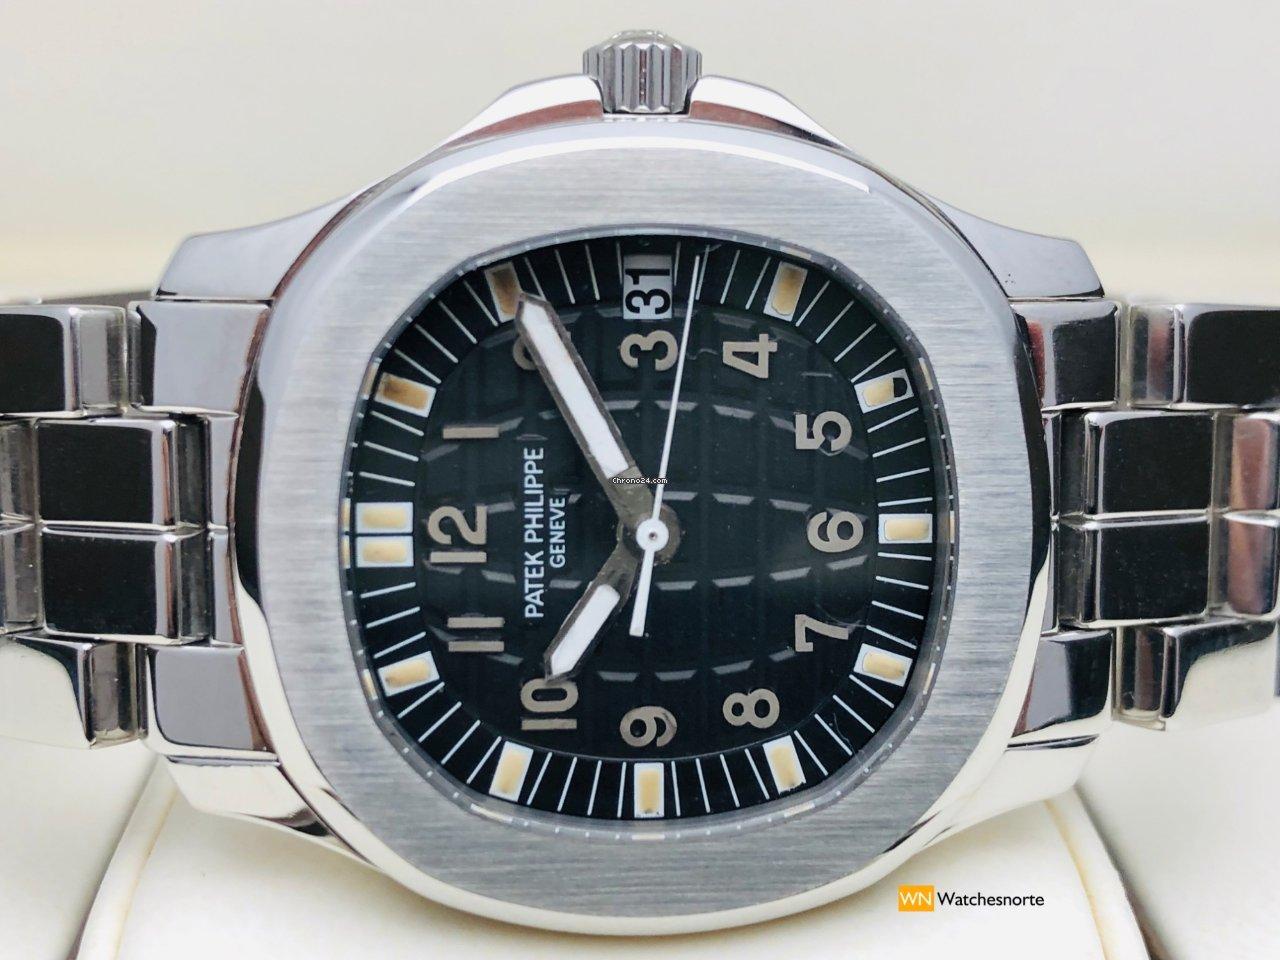 aa23cbd95fa2 Relojes Patek Philippe - Precios de todos los relojes Patek Philippe en  Chrono24